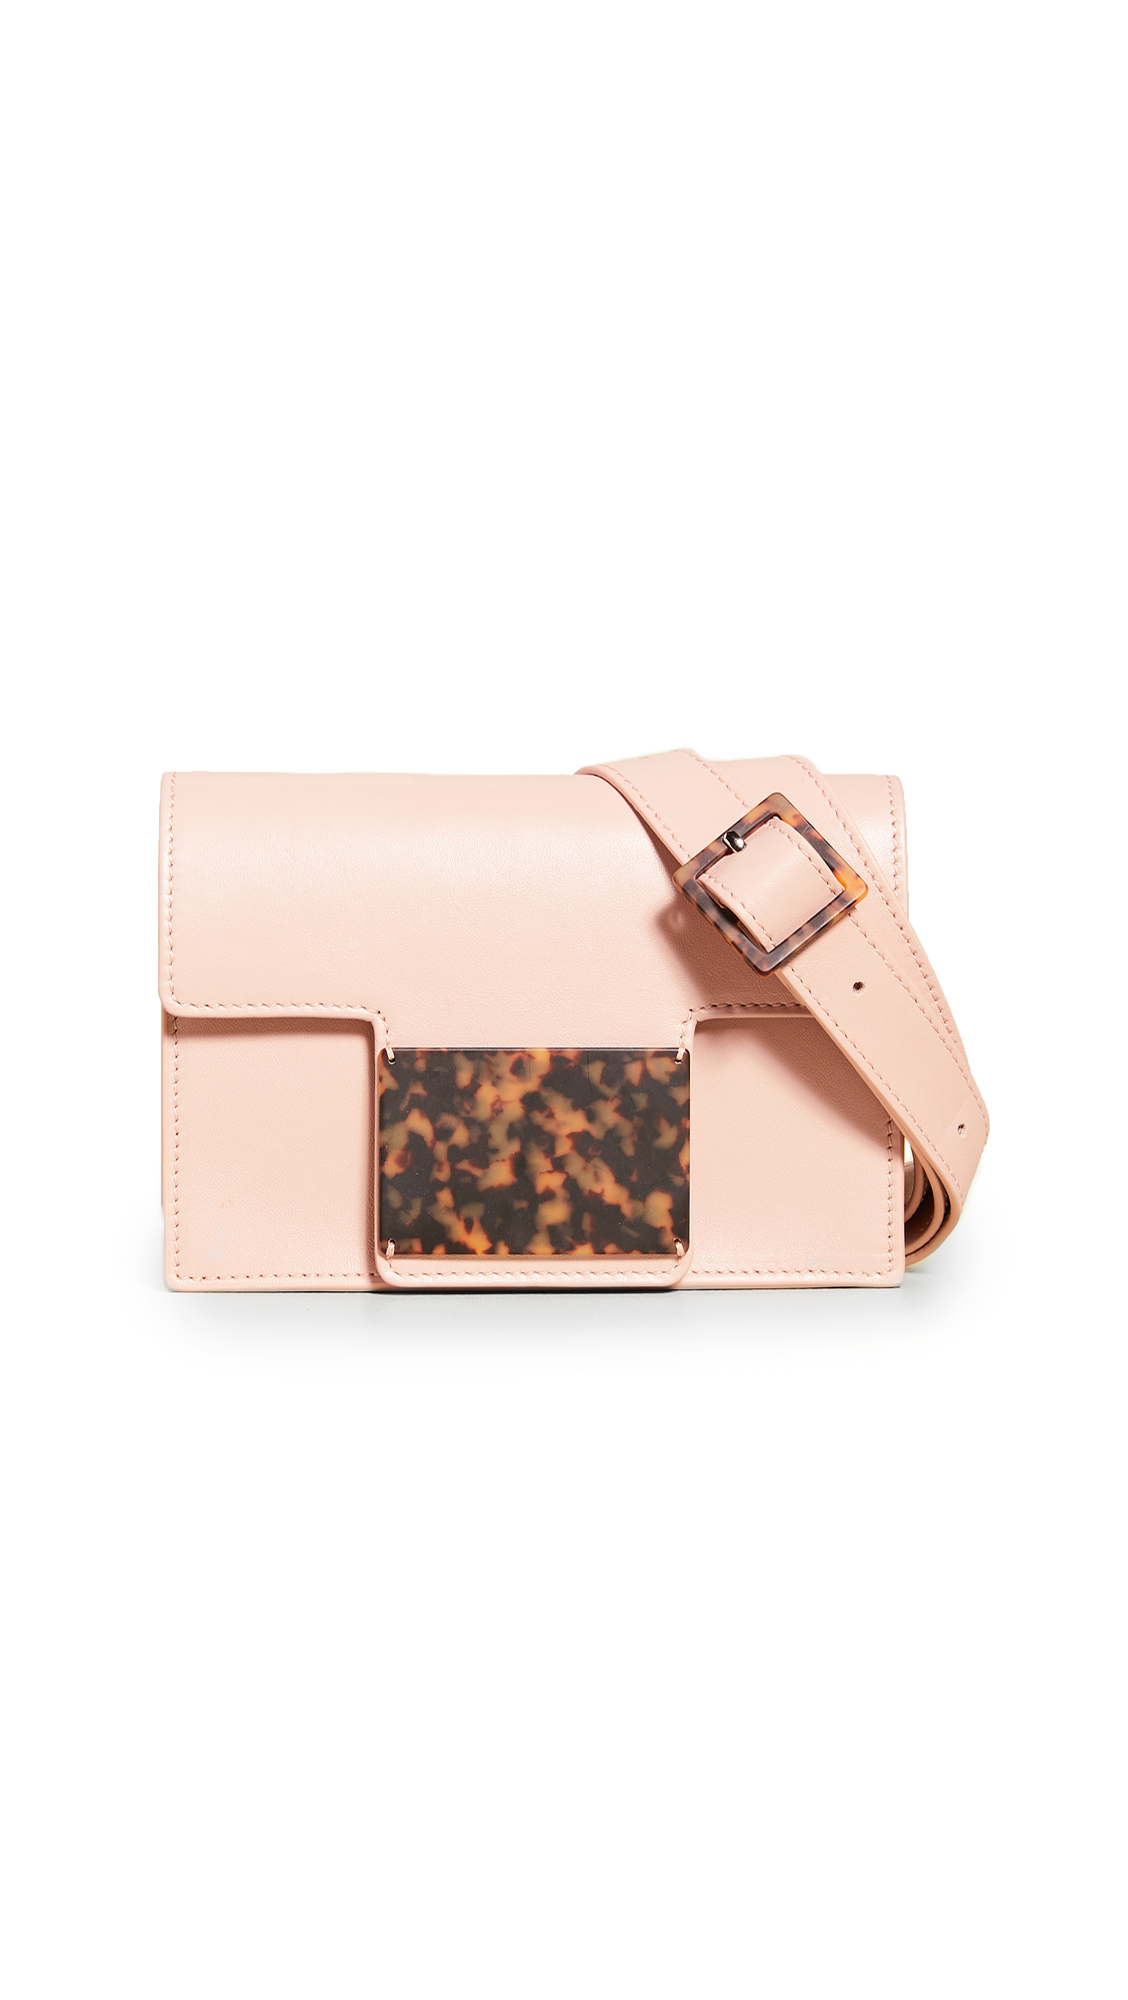 Montunas Cala Convertible Belt Bag In Blush